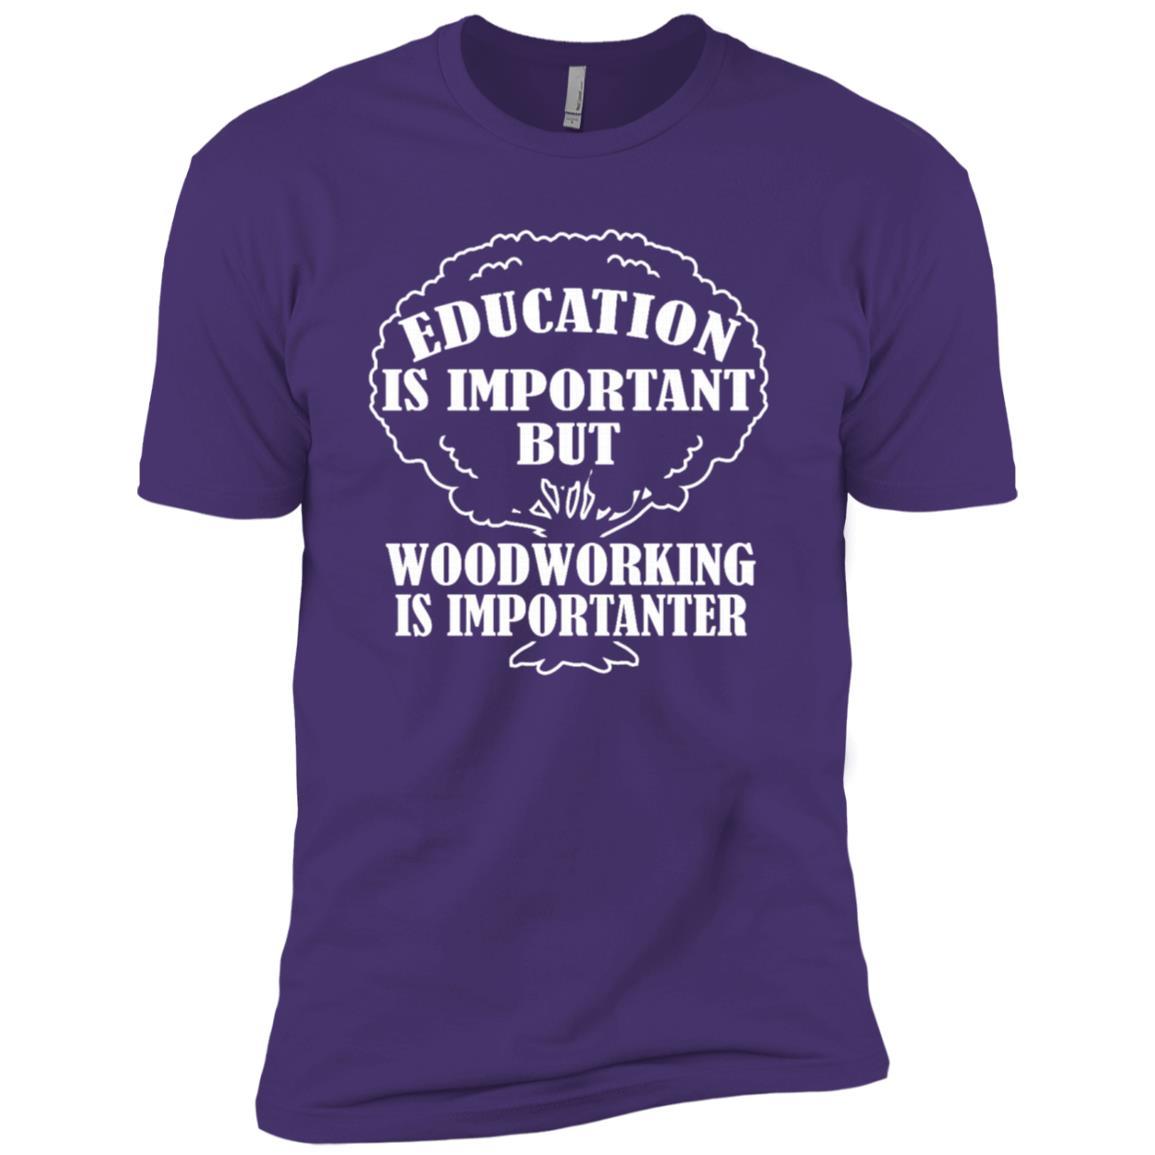 Woodworking Is Importanter Woodworking Mens Gift -1 Men Short Sleeve